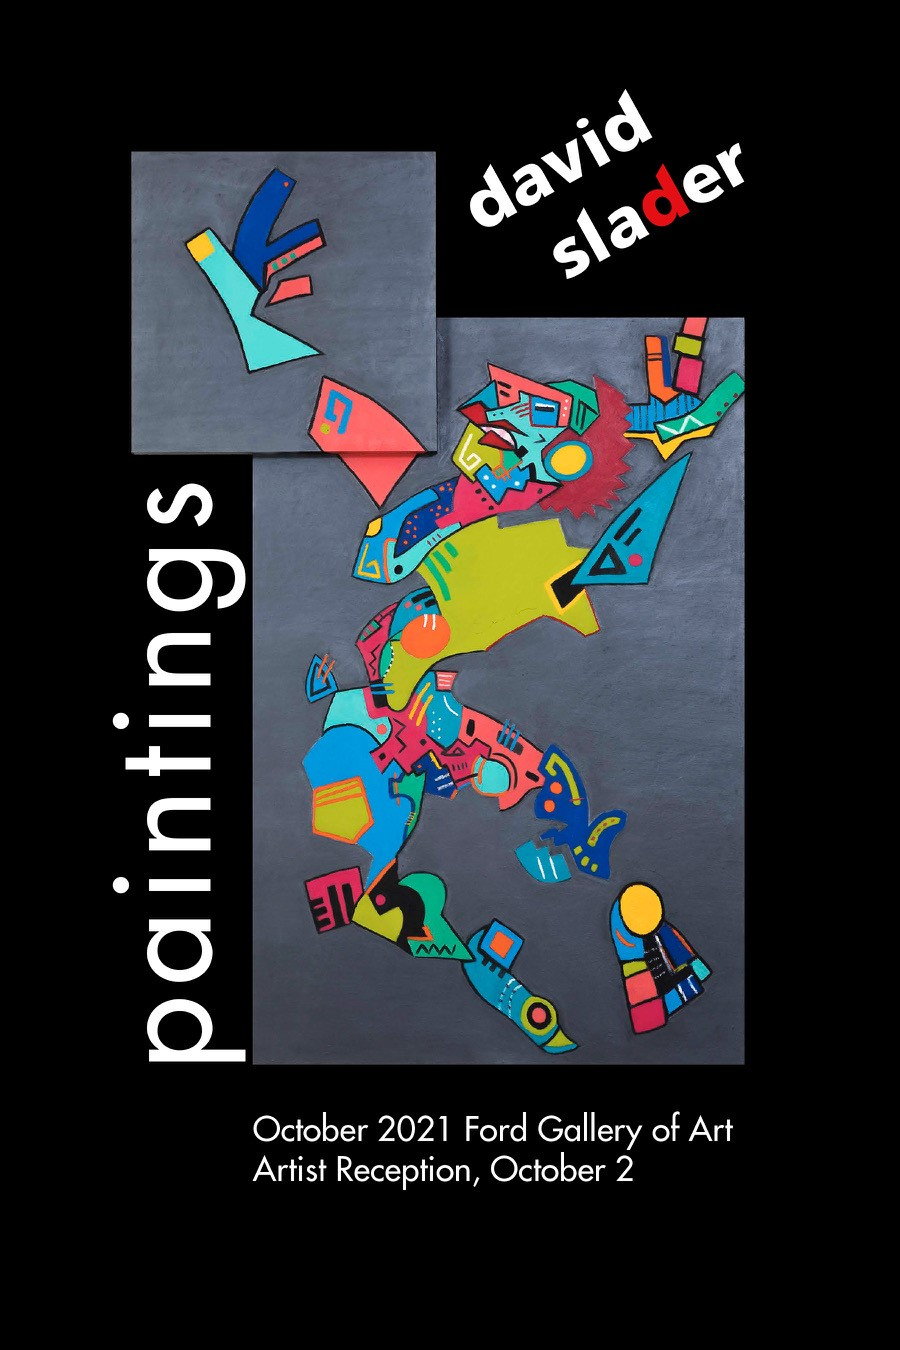 david slader paintings, ford gallery of art, october 2021